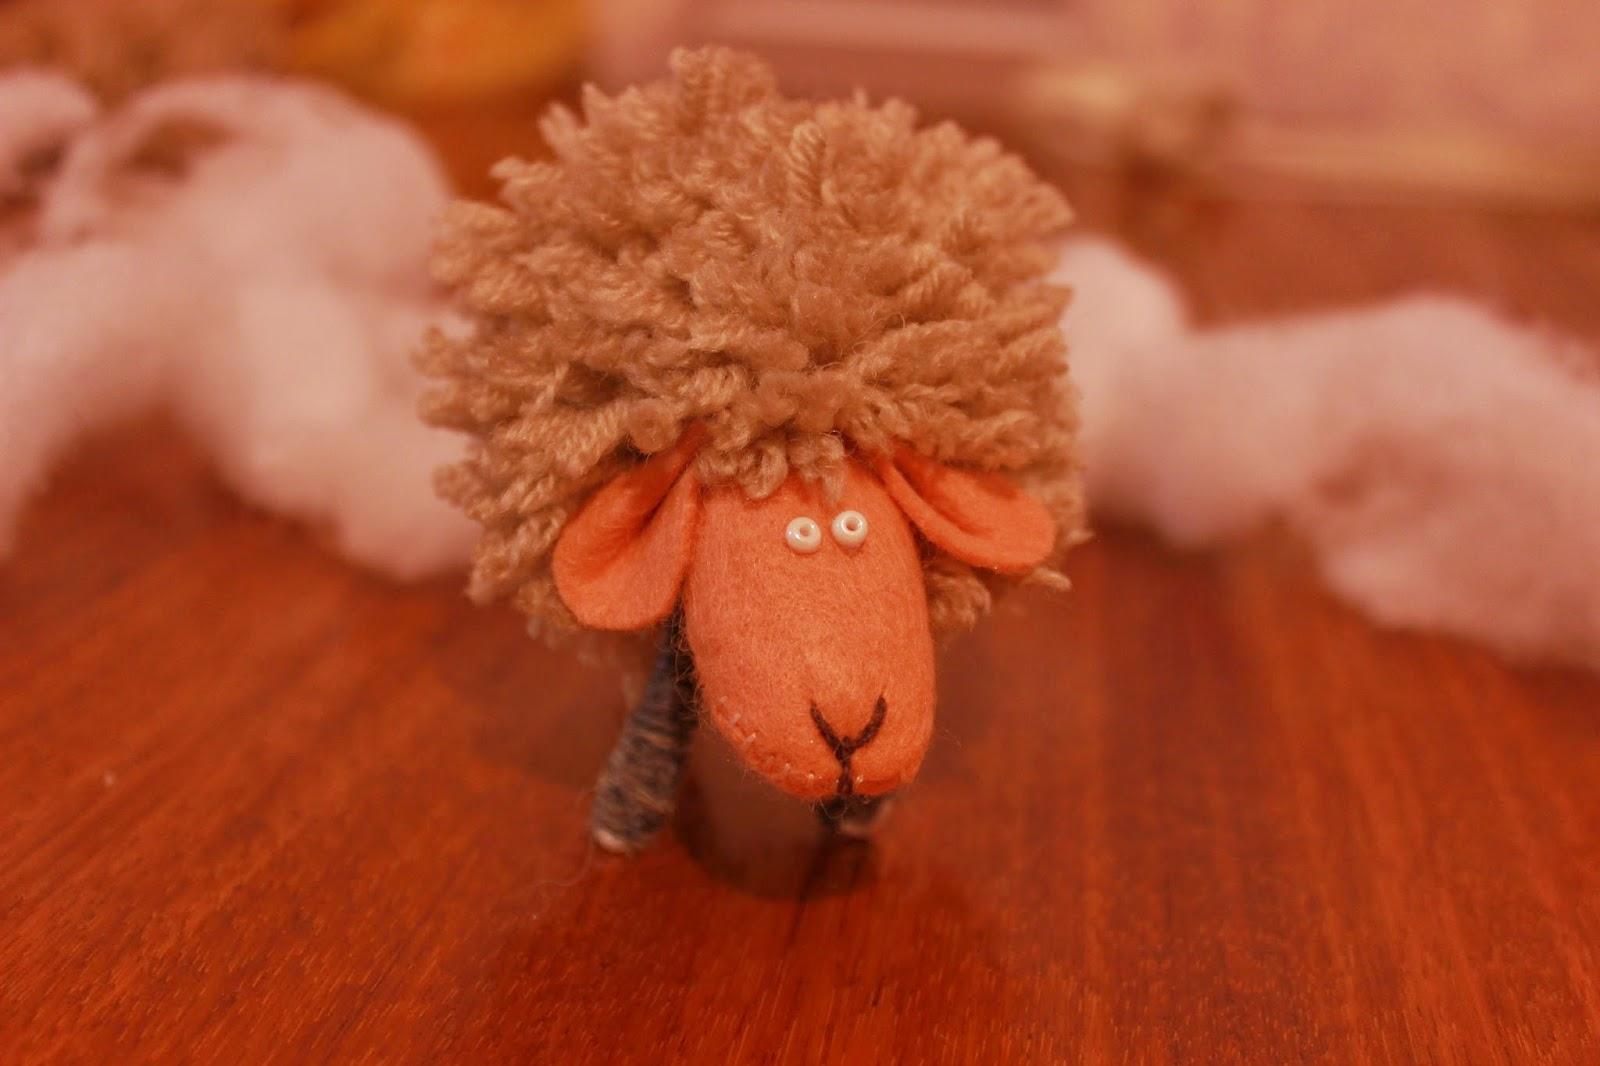 мастер-класс овечка, овца, коза, год овечки, год козы, символ года своими руками, настроение своими руками,хендмейд, овечка своими руками, мастерим с детьми